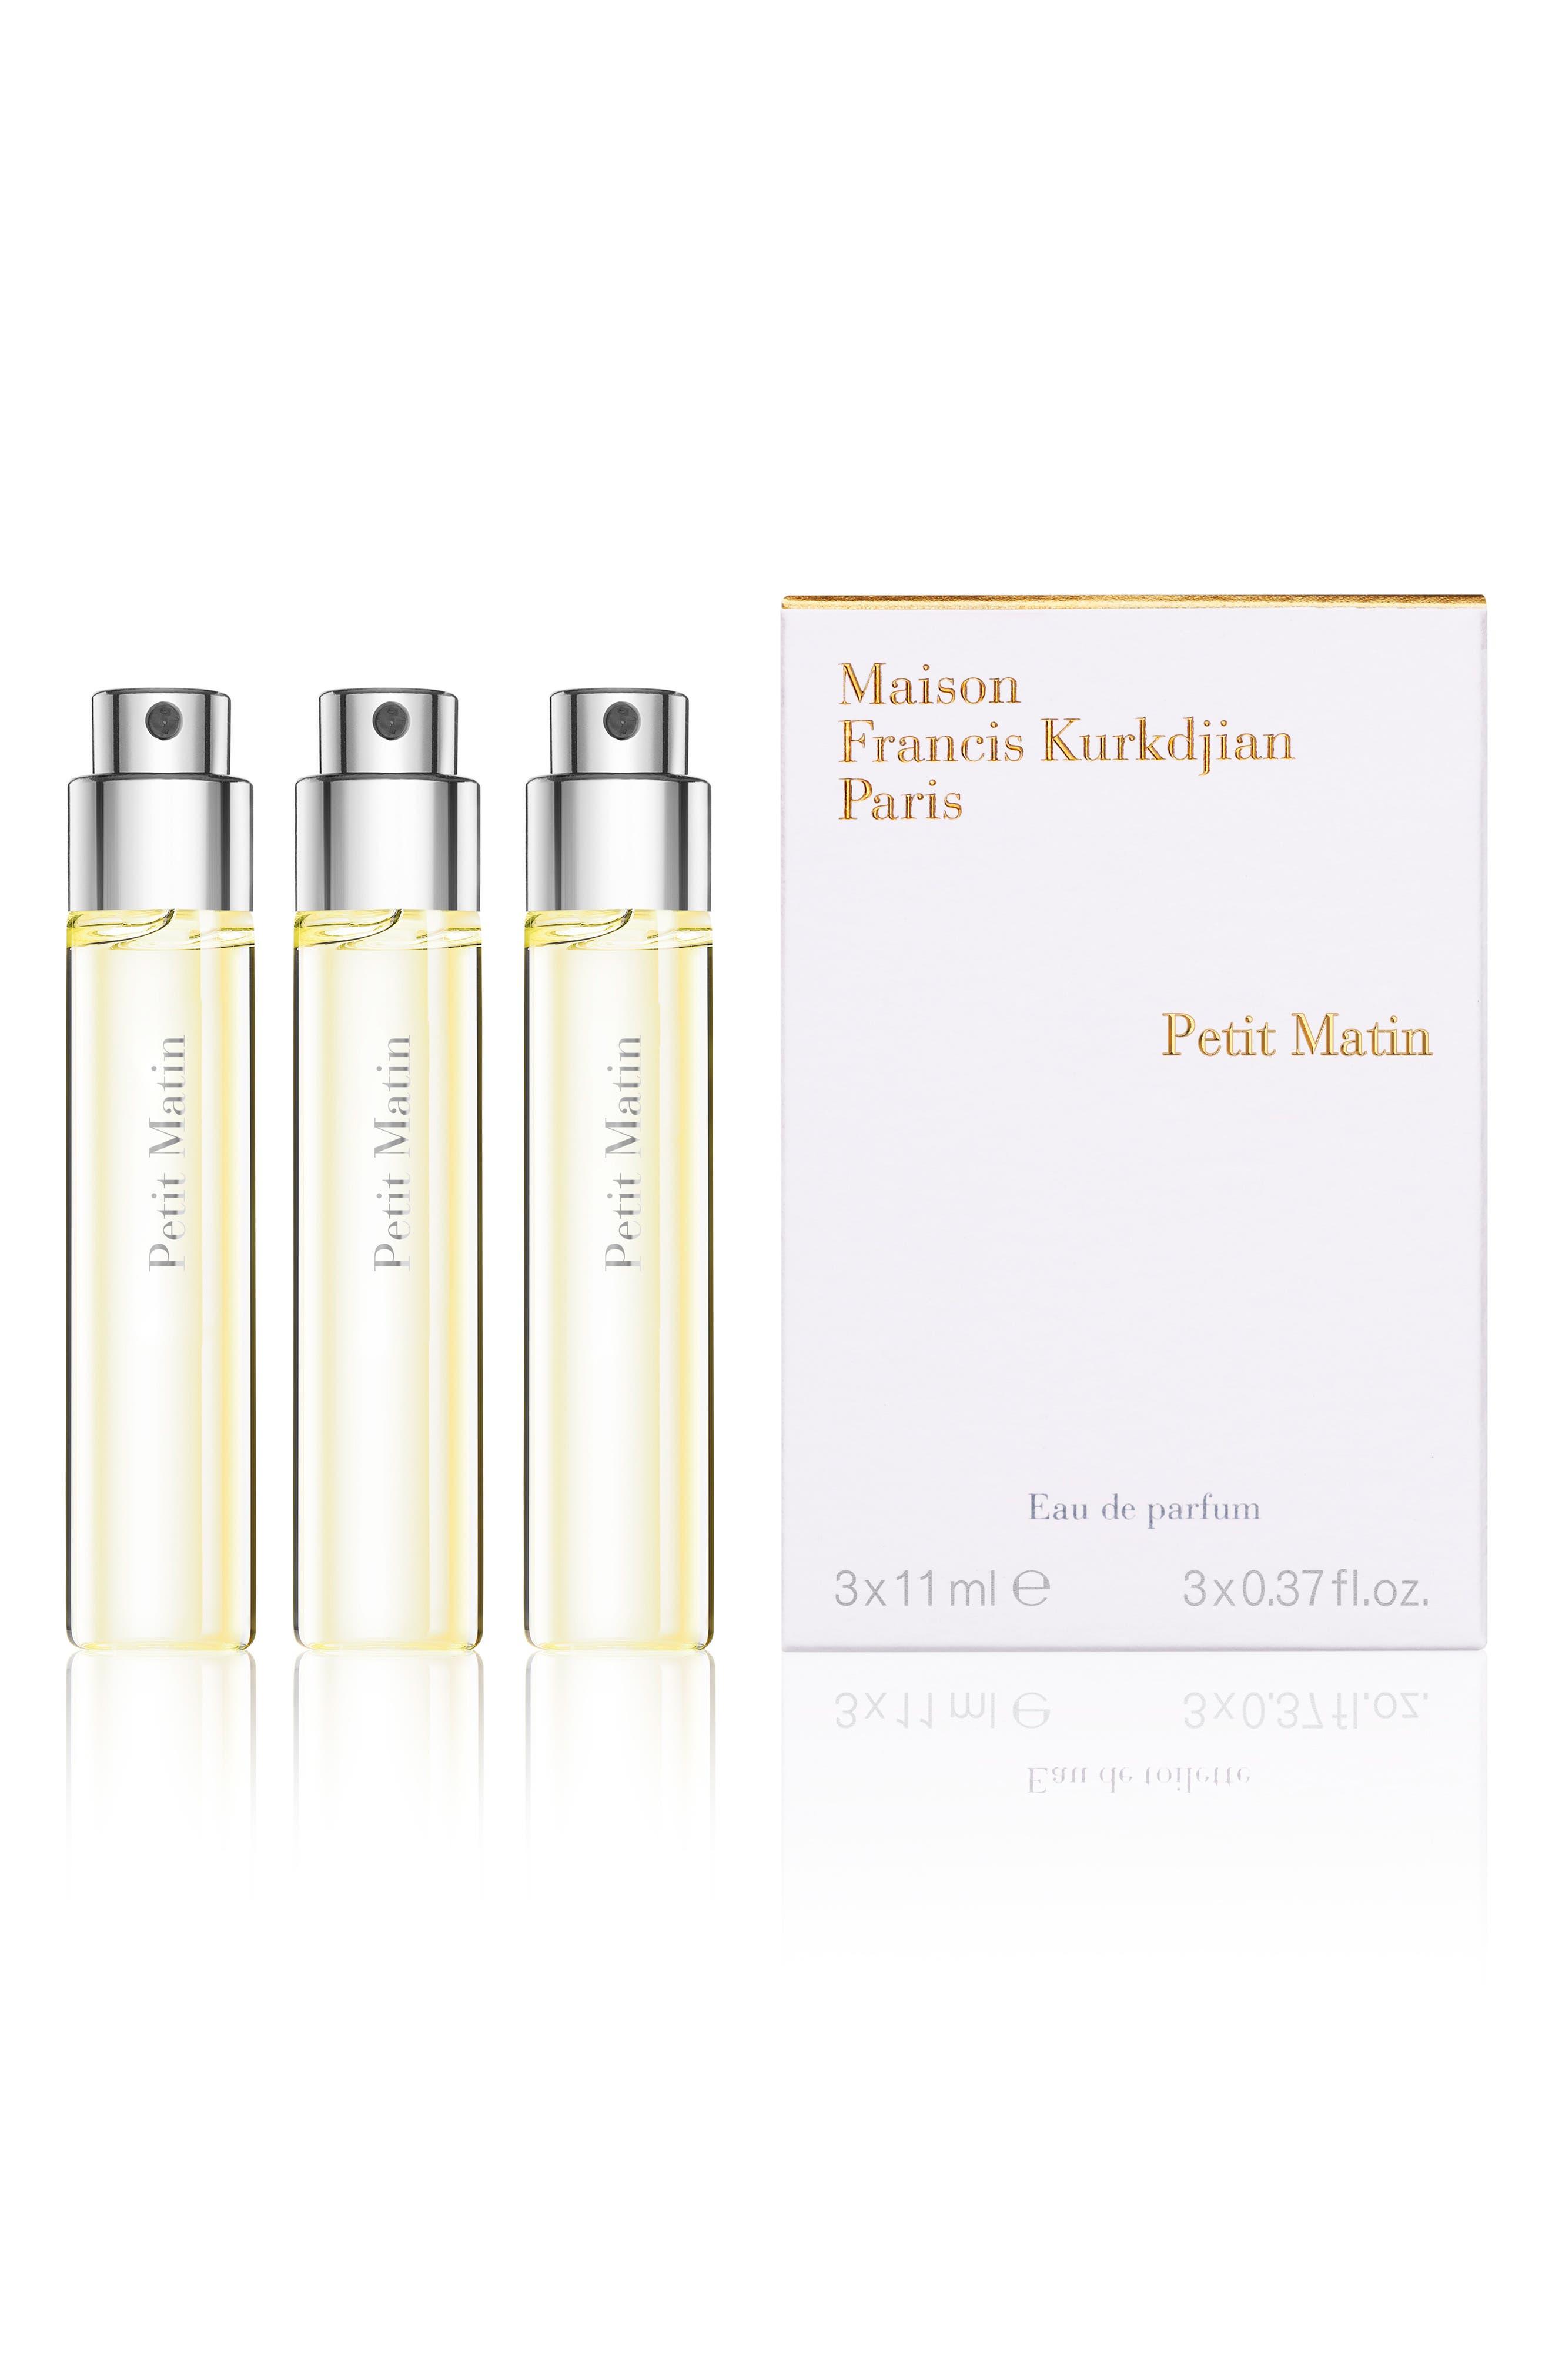 Paris Petit Matin Eau De Parfum Travel Spray Trio